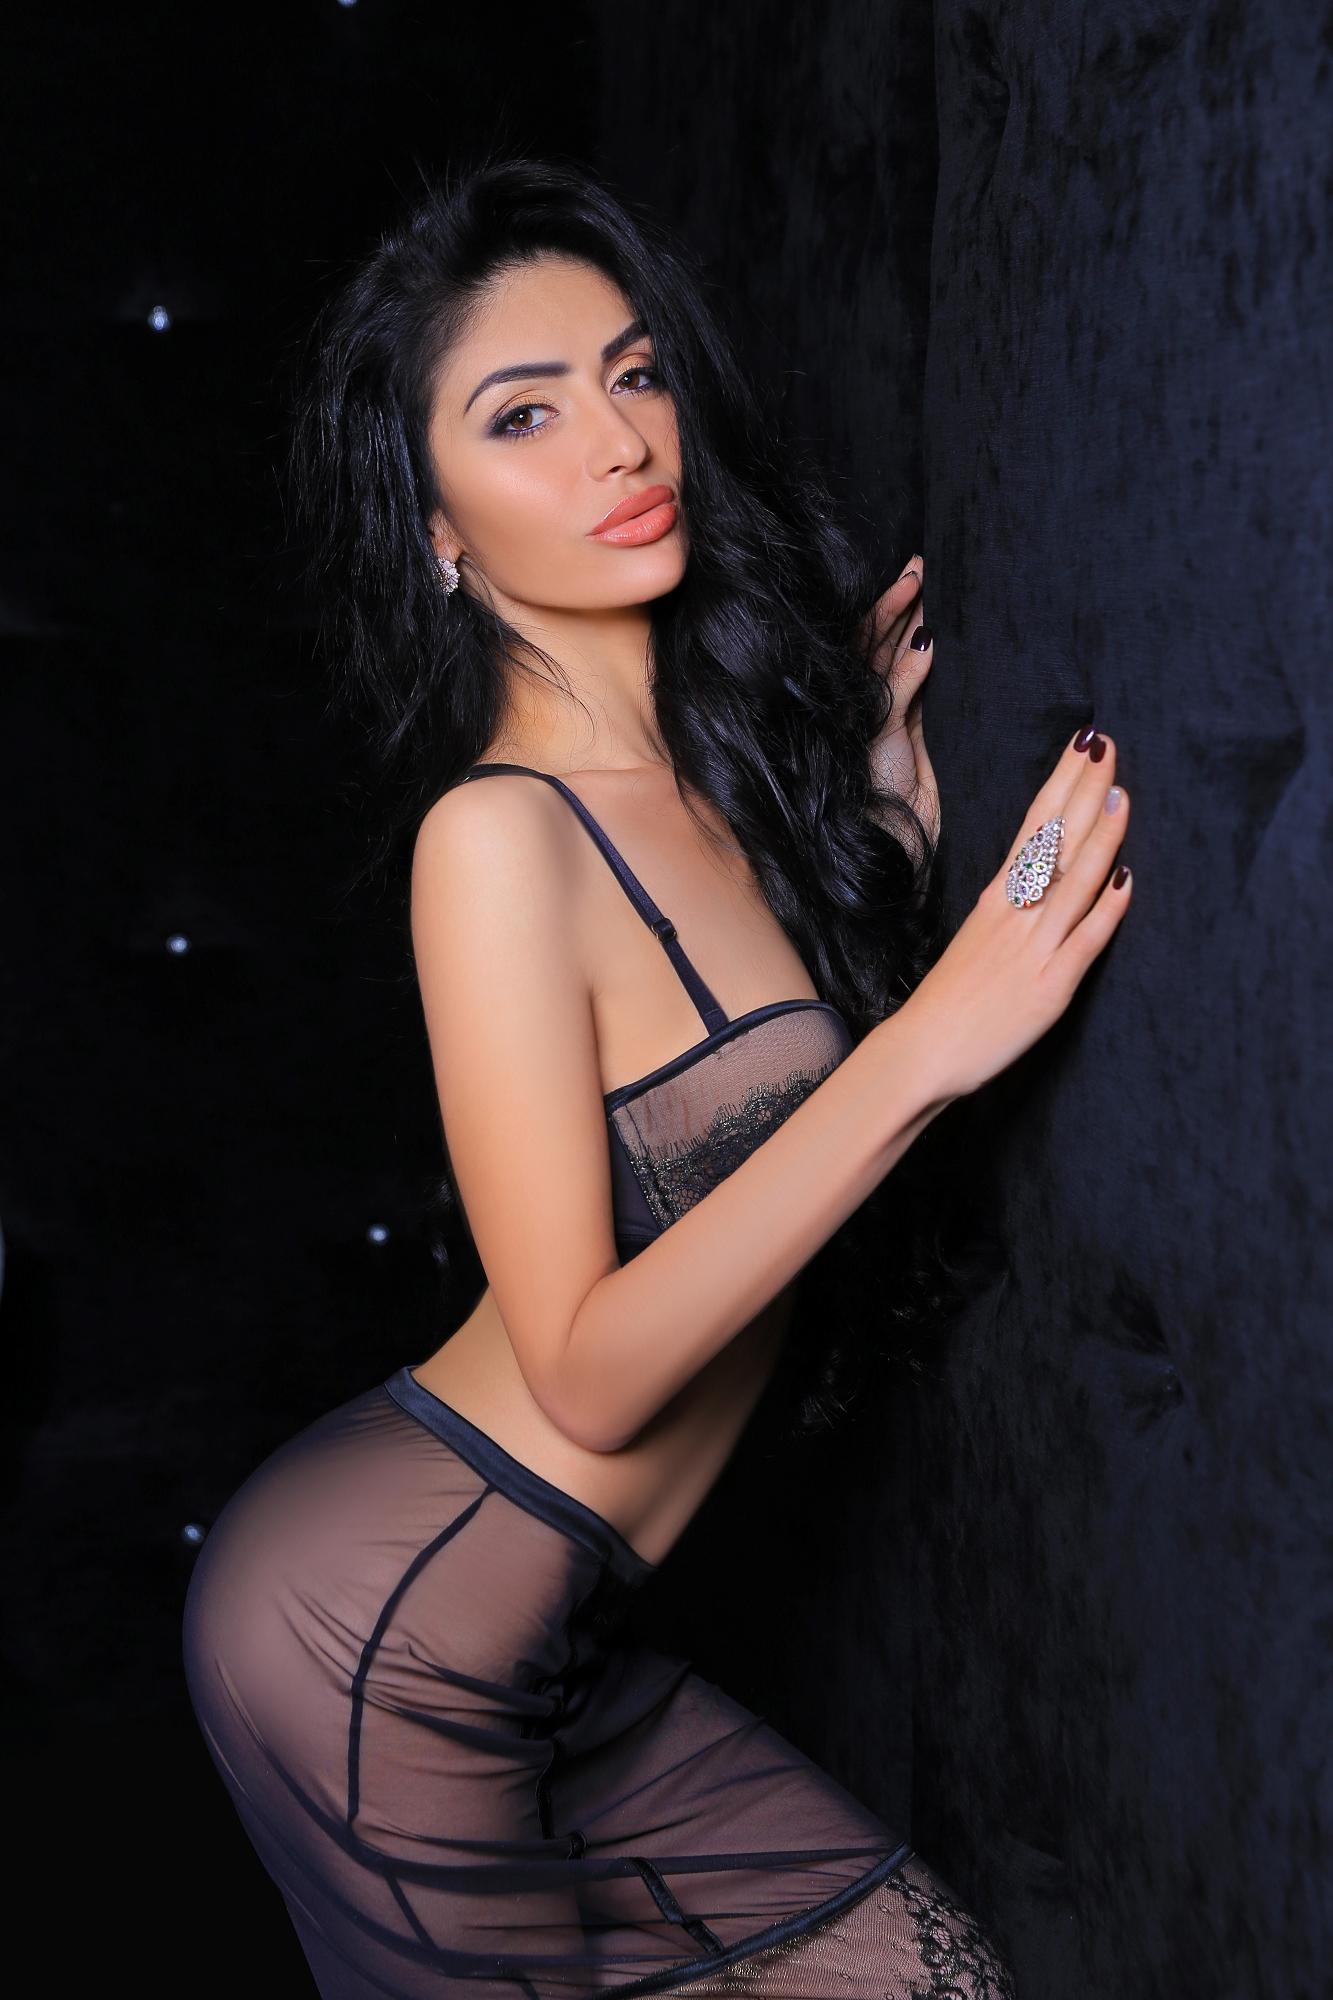 Проститутка москвы кармен 16 фотография